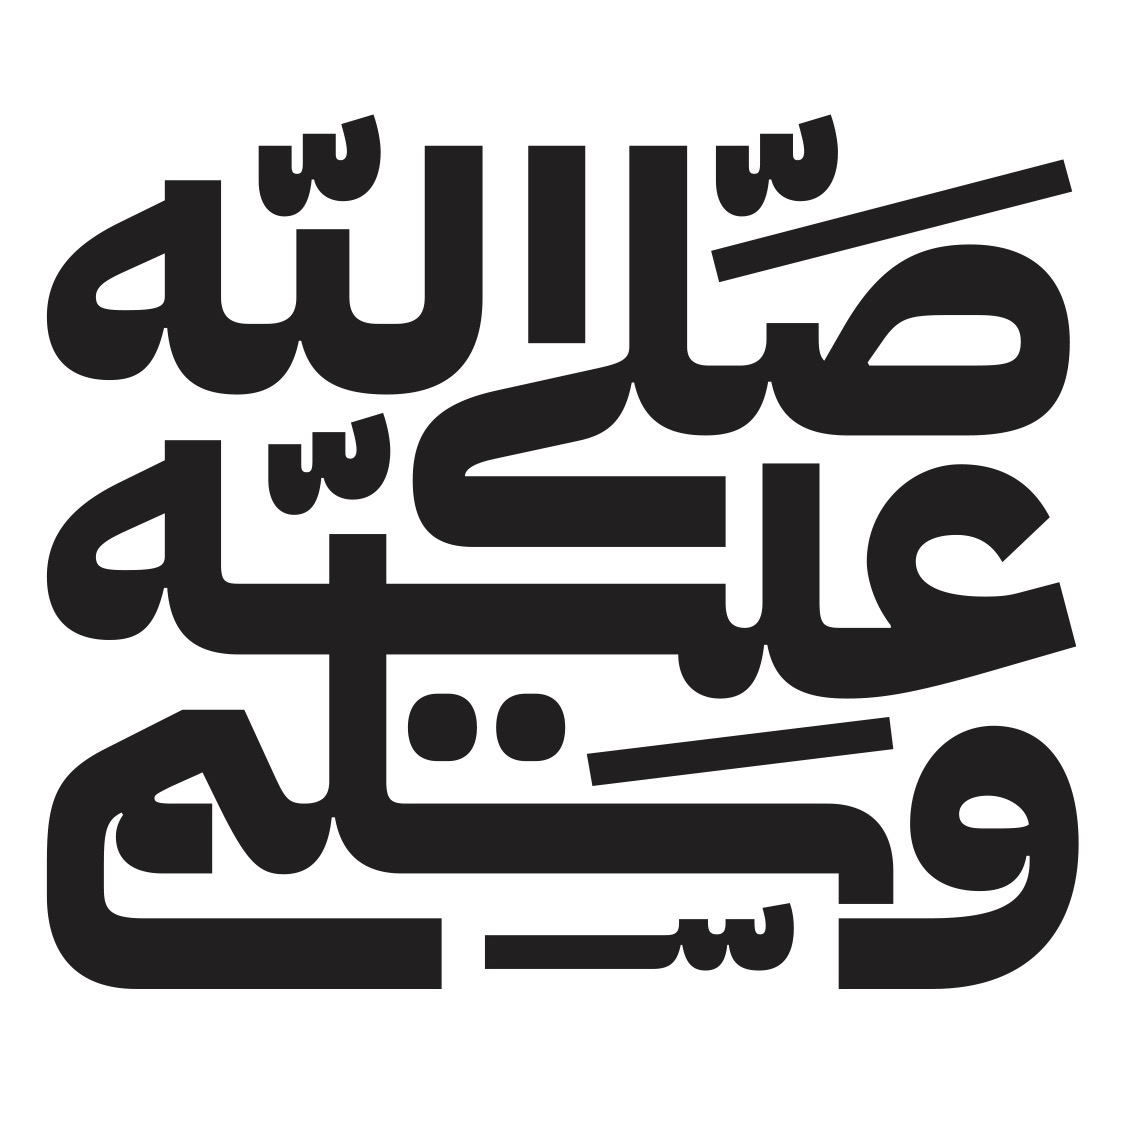 آی بی ام پلکس عربی  نازک